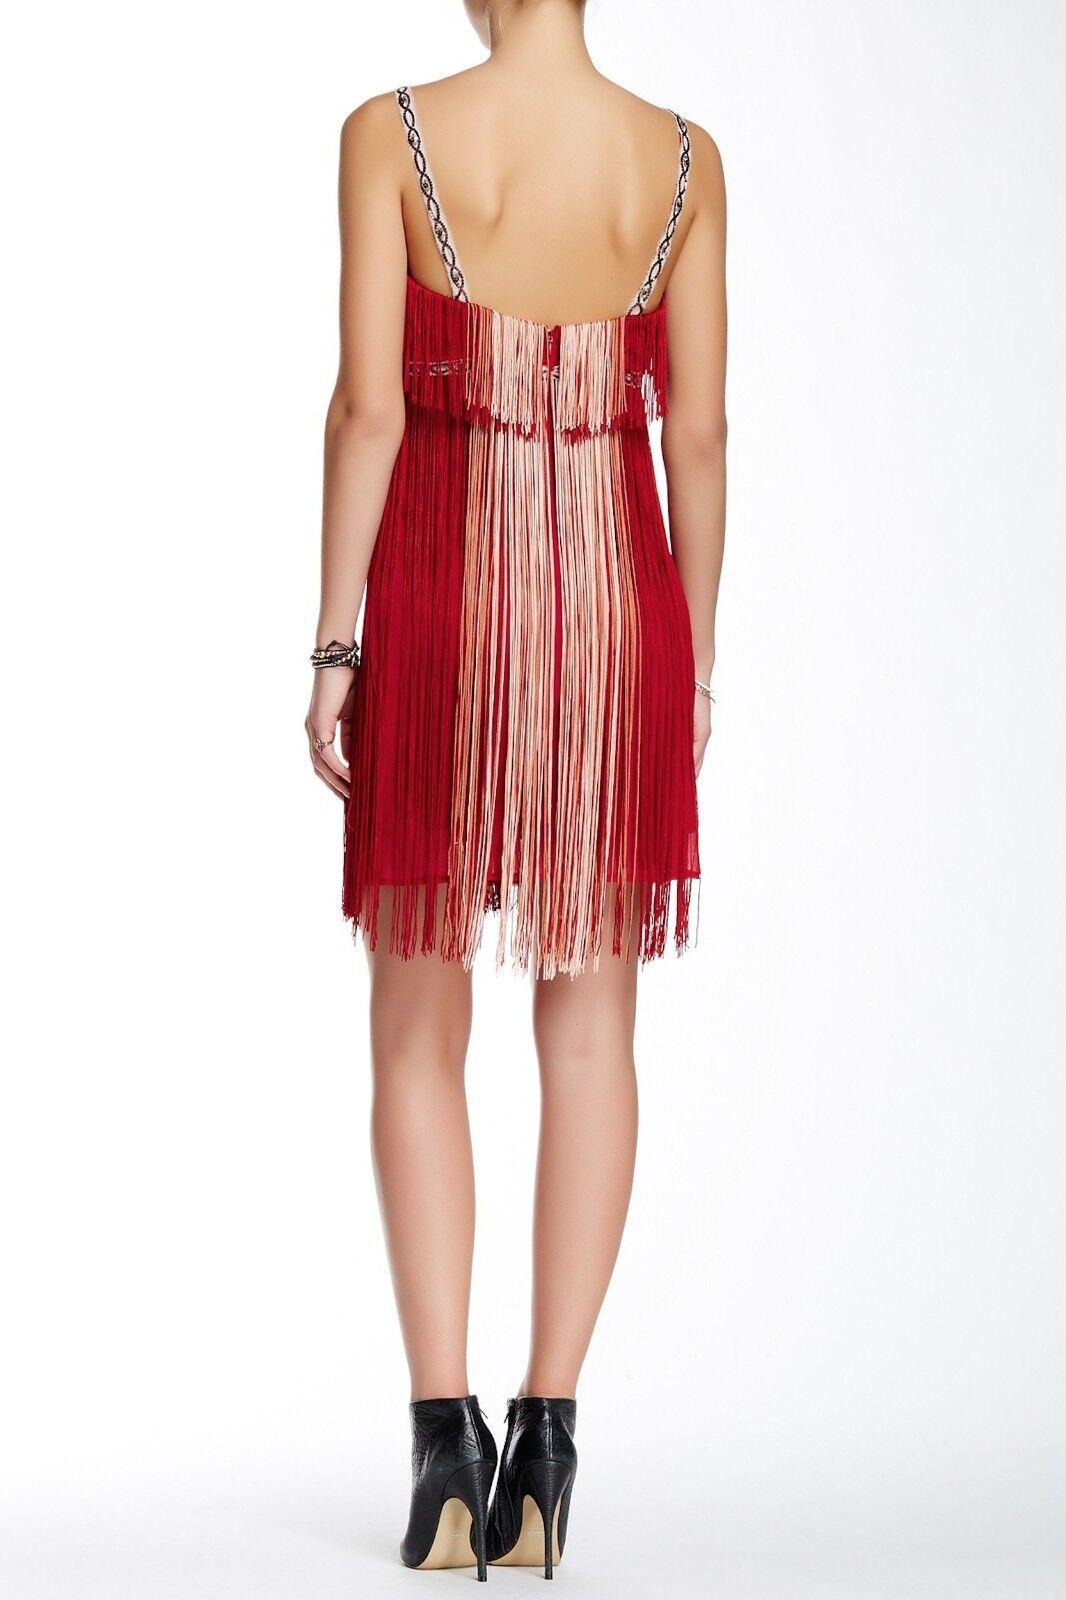 FREE PEOPLE Art Deco Deco Deco Fringe Festive Dress Red Combo Sz 6  400 NWT F796Y291S a31abb